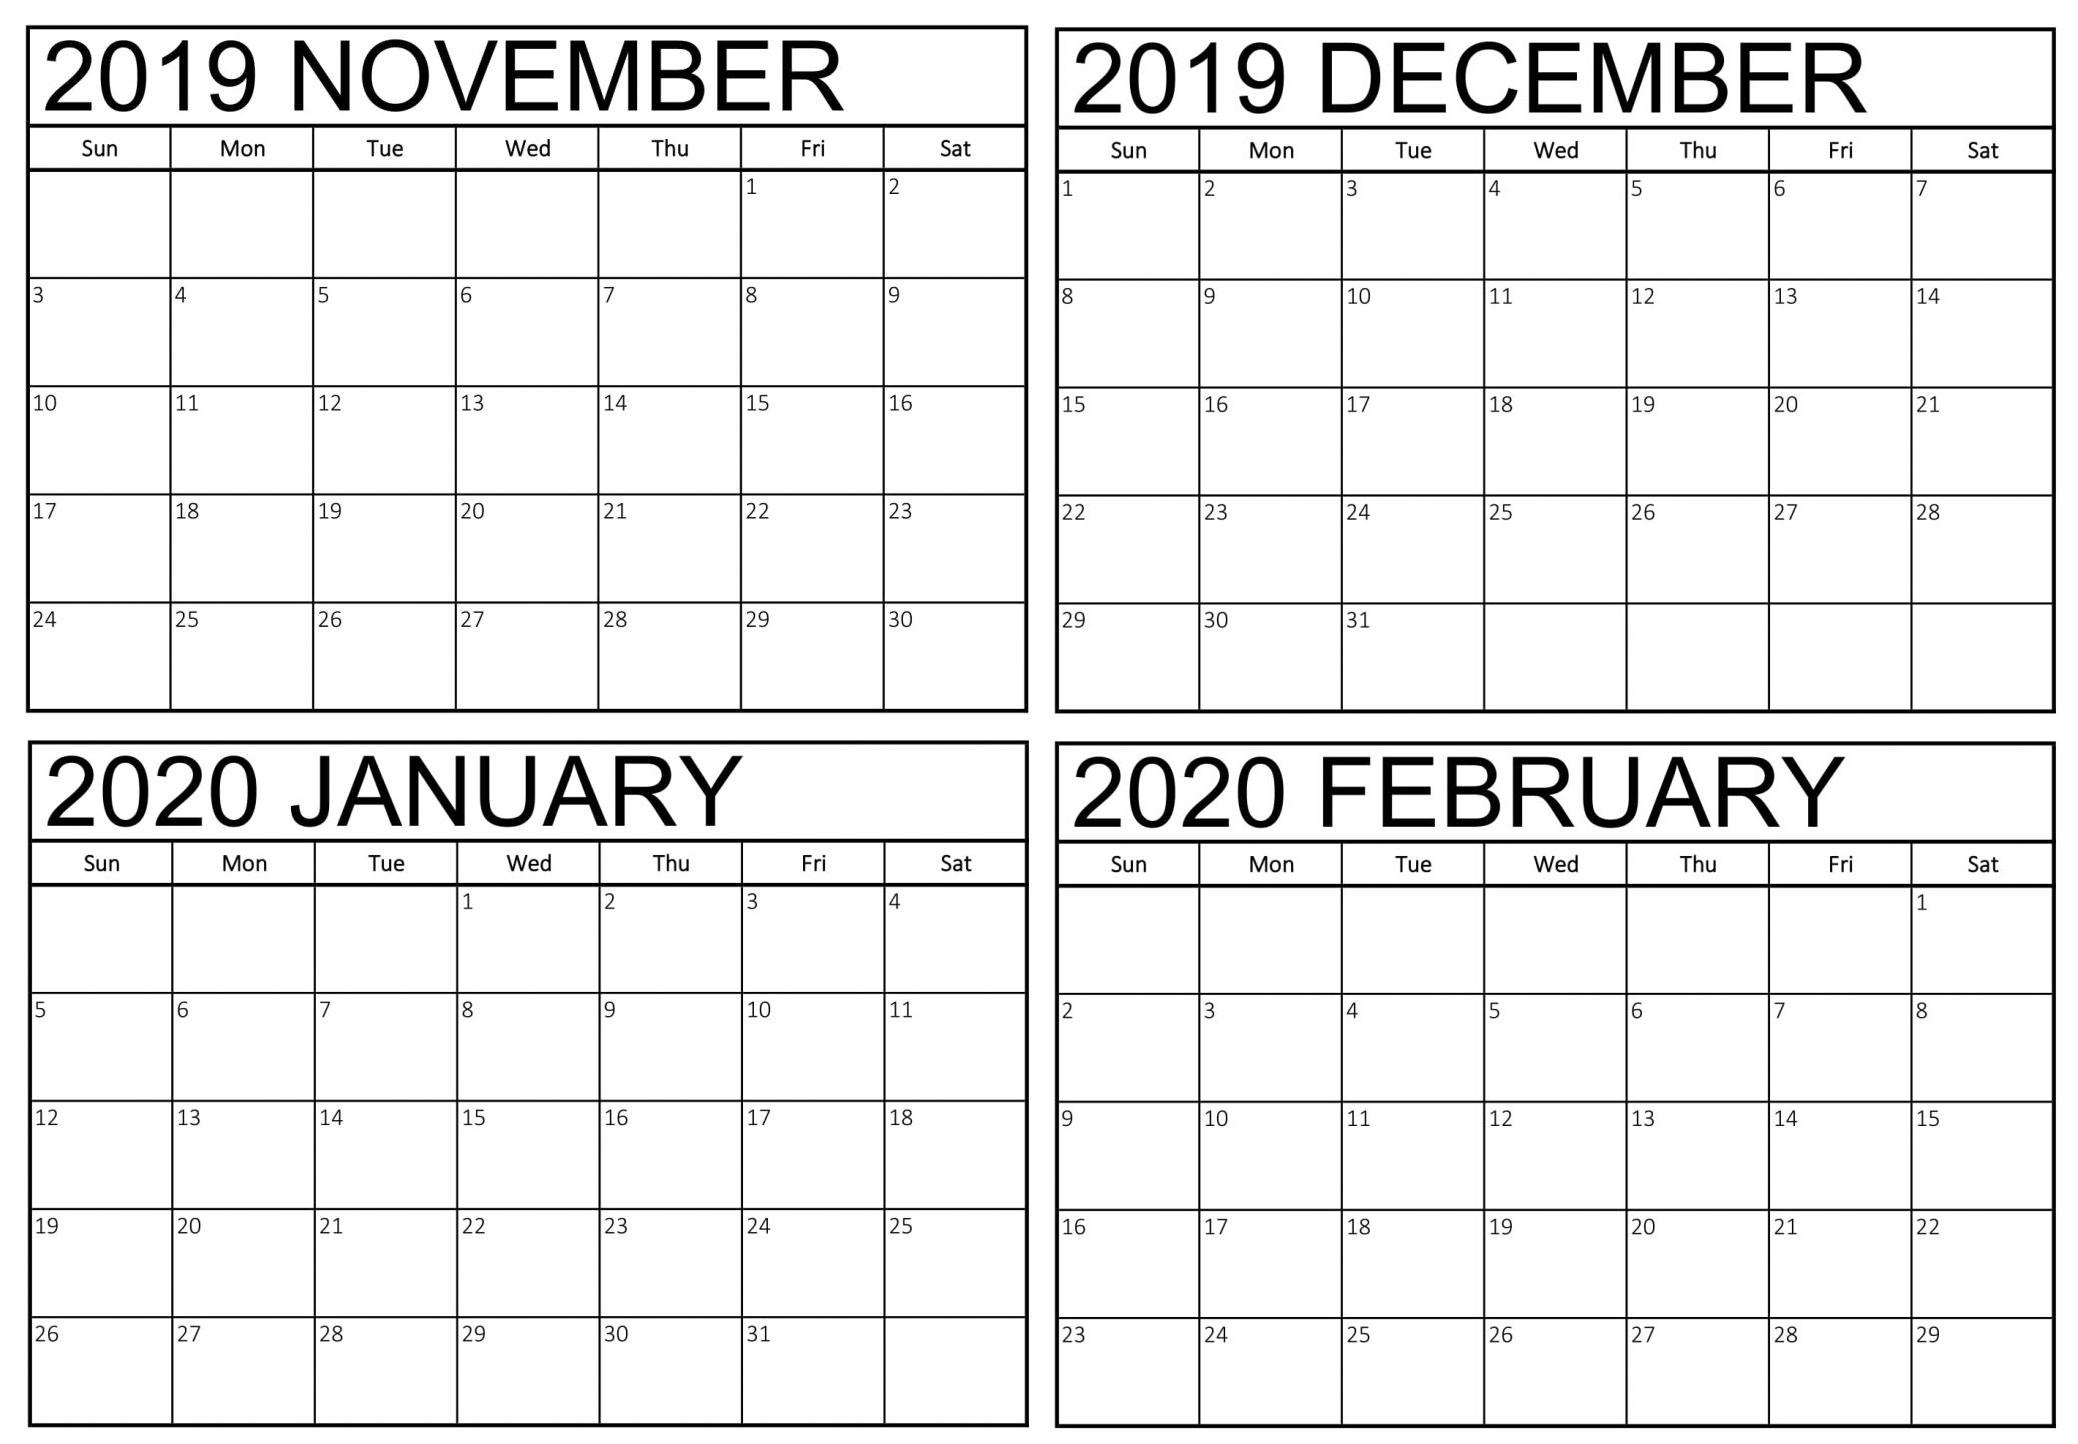 Blank November 2019 To February 2020 Calendar - 2019-4 Month Calendar 2020 Template